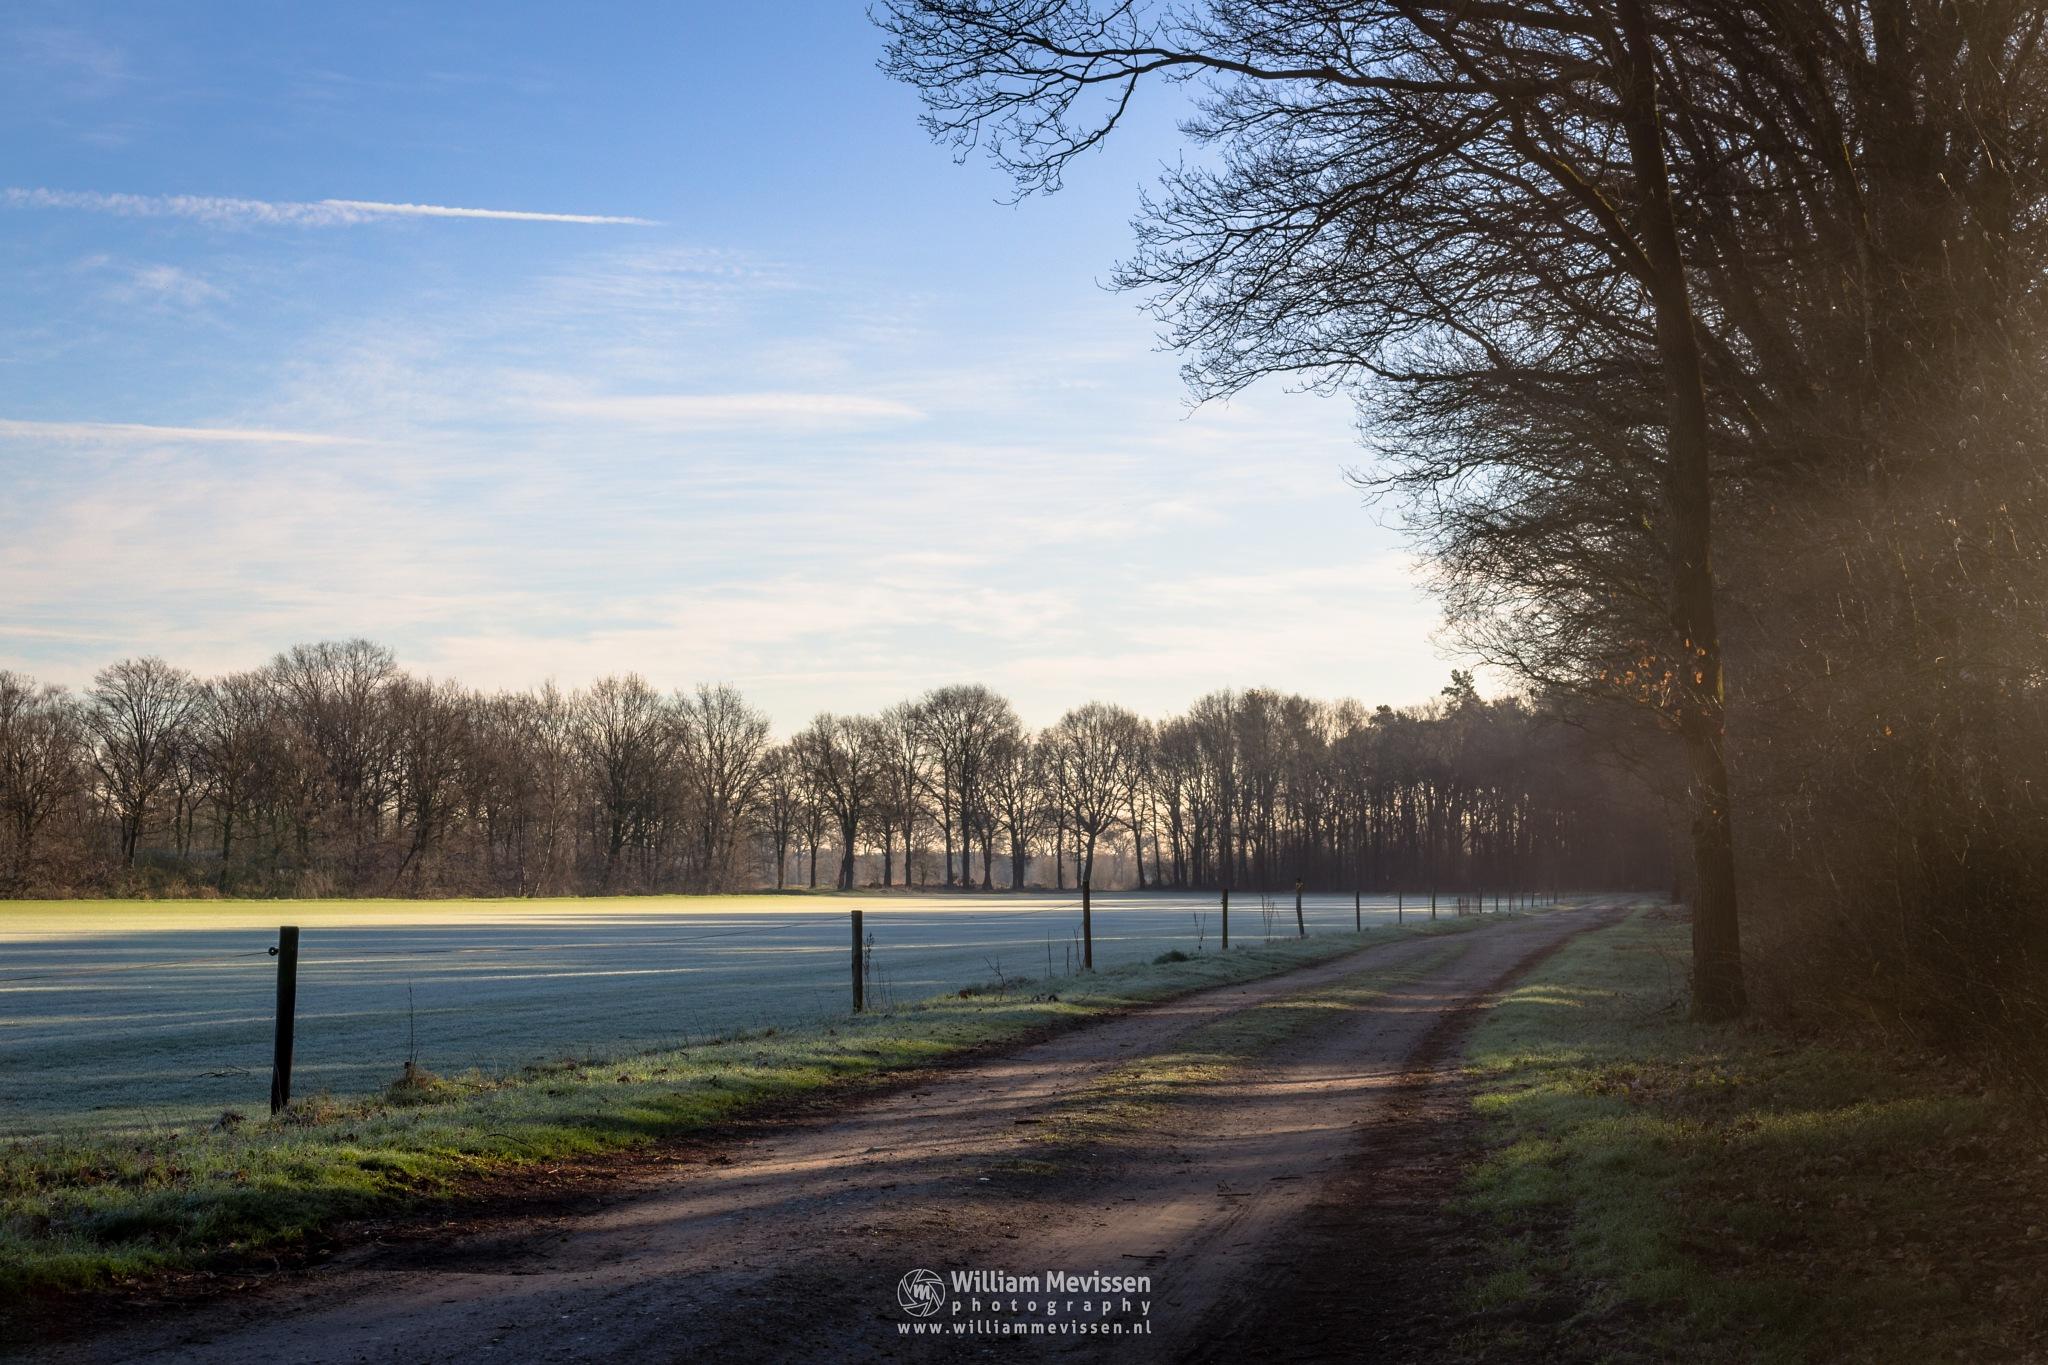 Cold Spring Morning by William Mevissen